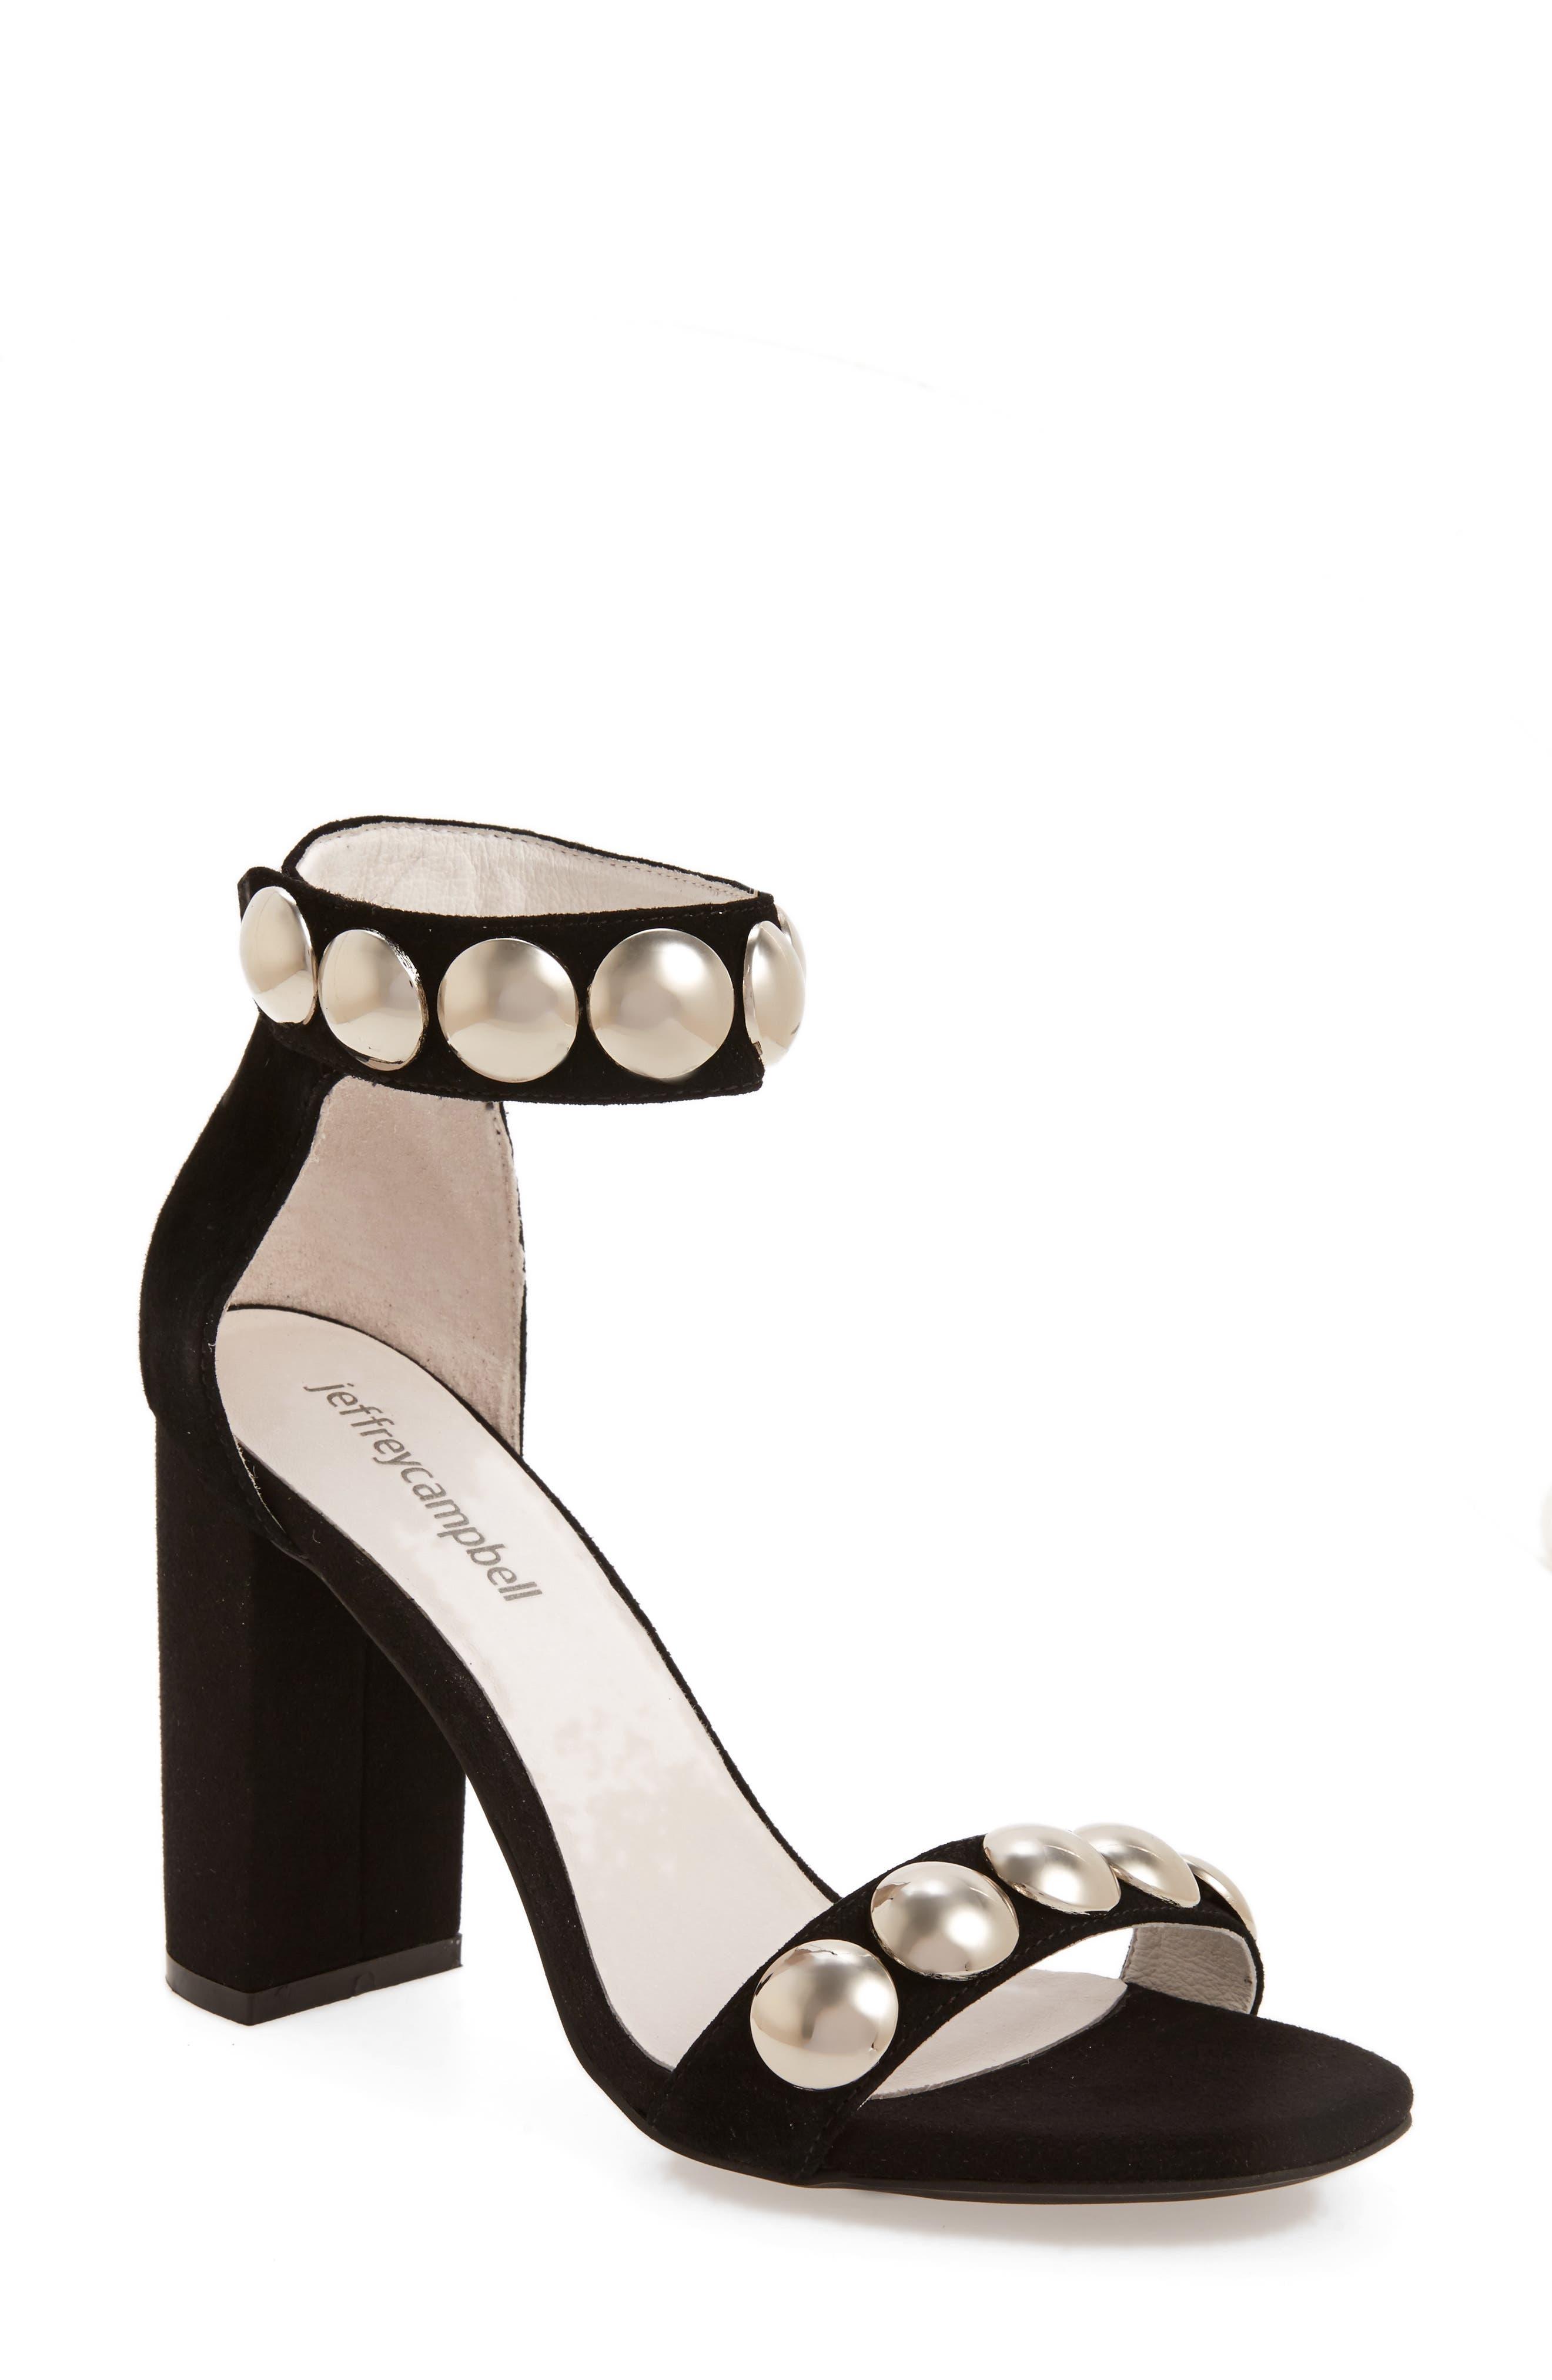 Main Image - Jeffrey Campbell Lindsay Dome Studded Sandal (Women)